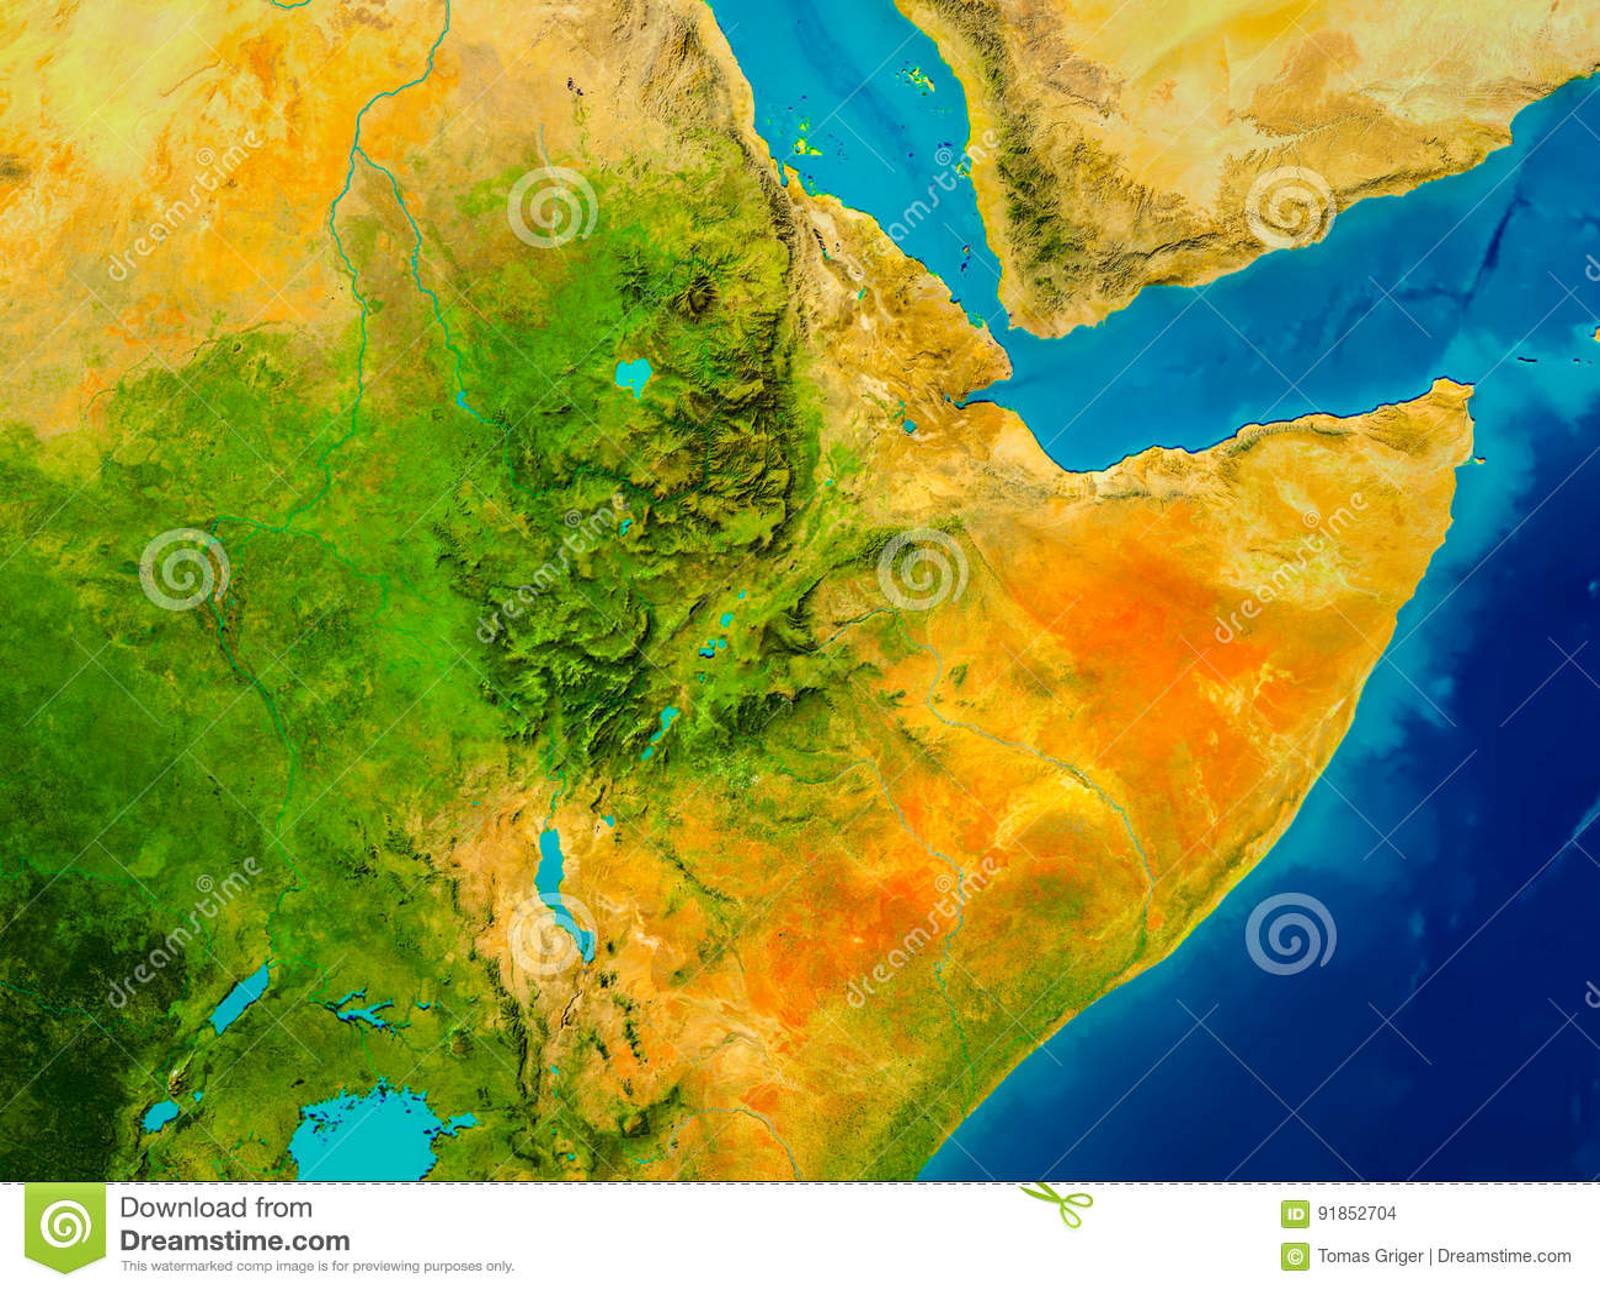 Ethiopia On Physical Map Stock Illustration Illustration Of